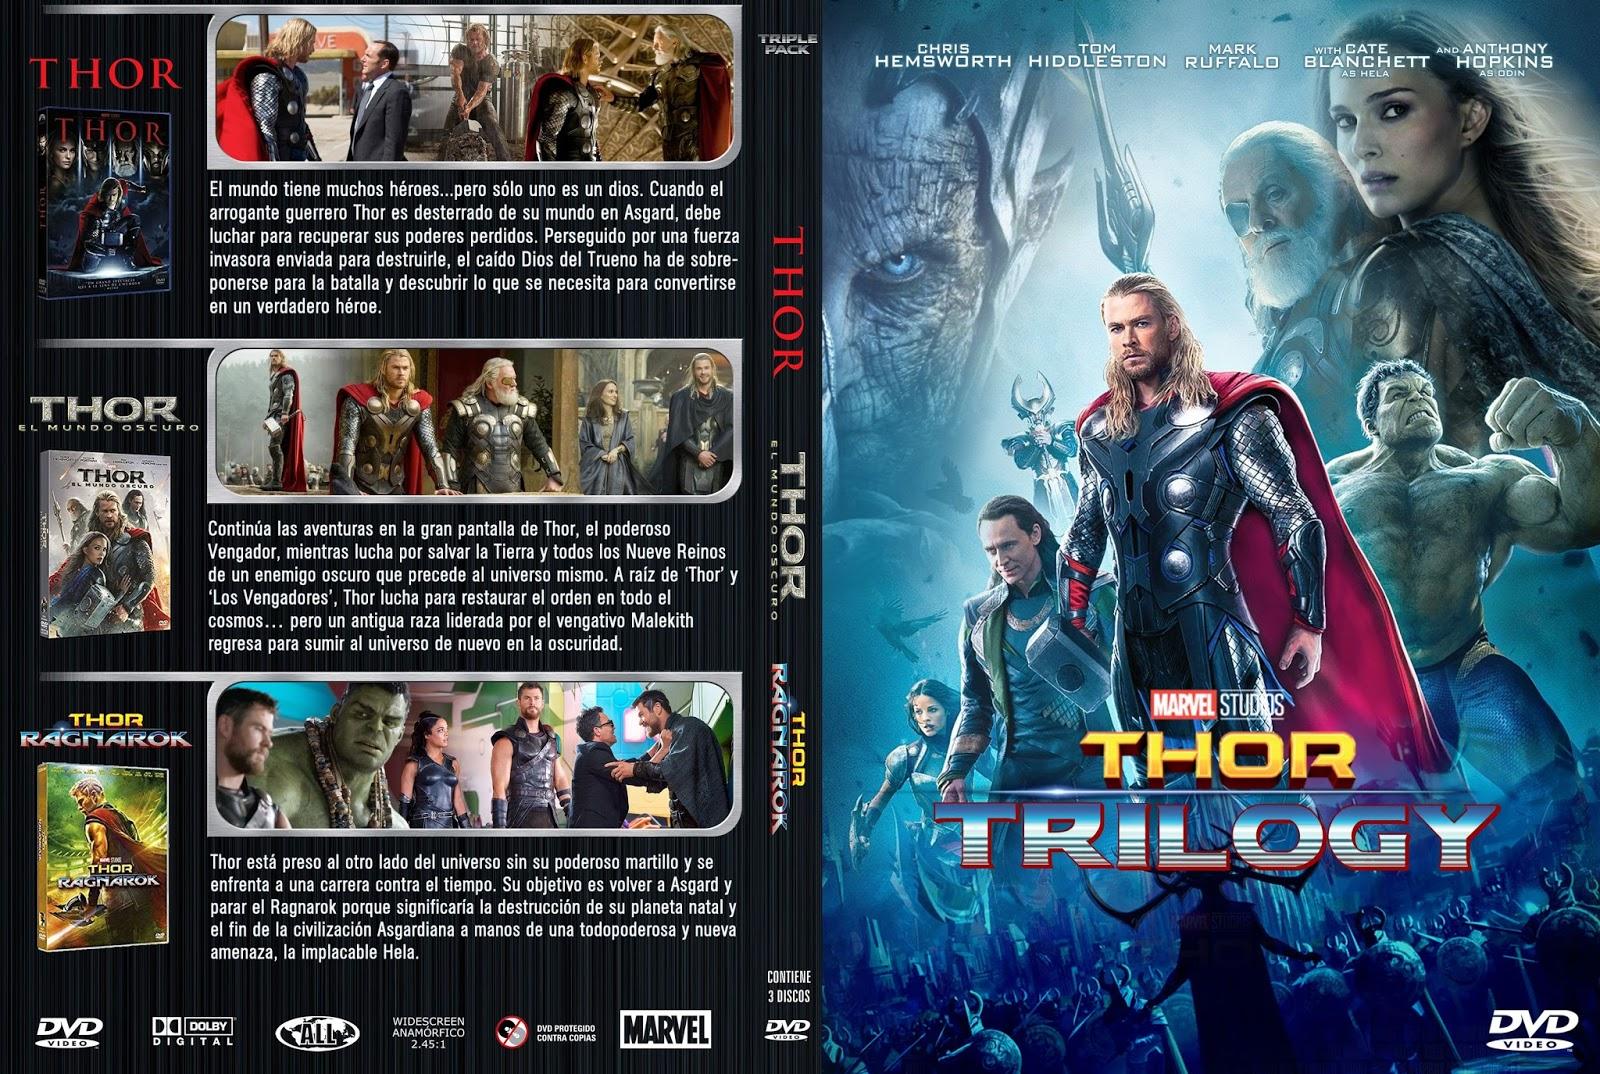 Thor Trilogy Ragnarok